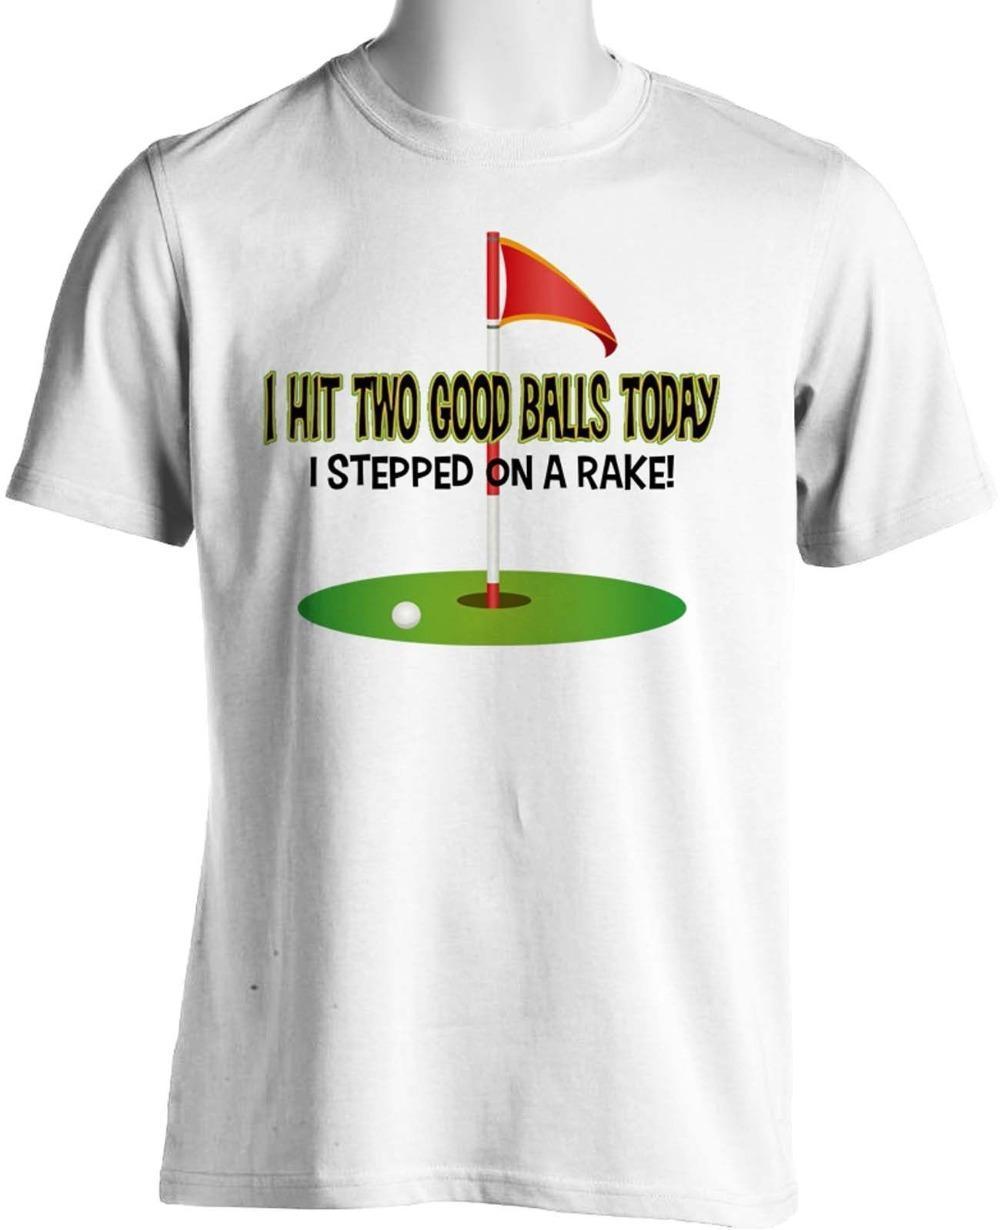 50e1911f Fashion Funny Tops Tees Funny Golfer Club T Shirt Hit Golfer Balls Humorous  Mens Cotton Tees T Shirt On Shirt Online Tee Shirts Shopping From Jie024,  ...